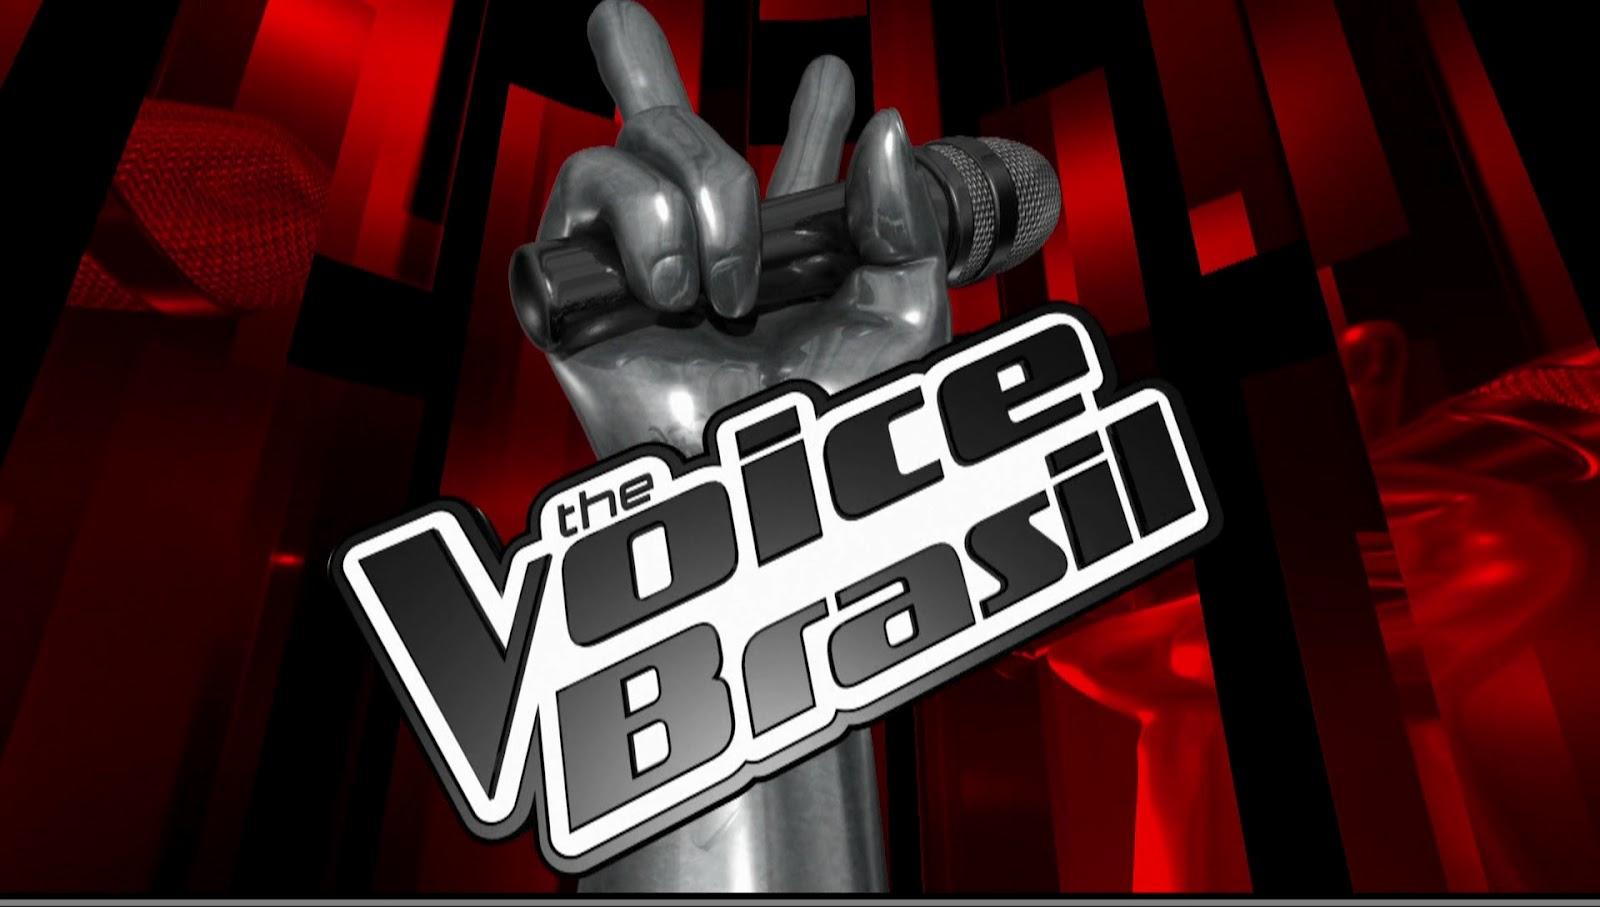 http://2.bp.blogspot.com/-HNKhh1kJy2Q/UVDUUqUzsLI/AAAAAAAANyY/i0CsEBVwSb0/s1600/The+Voice+Brasil+-+Capa.jpg